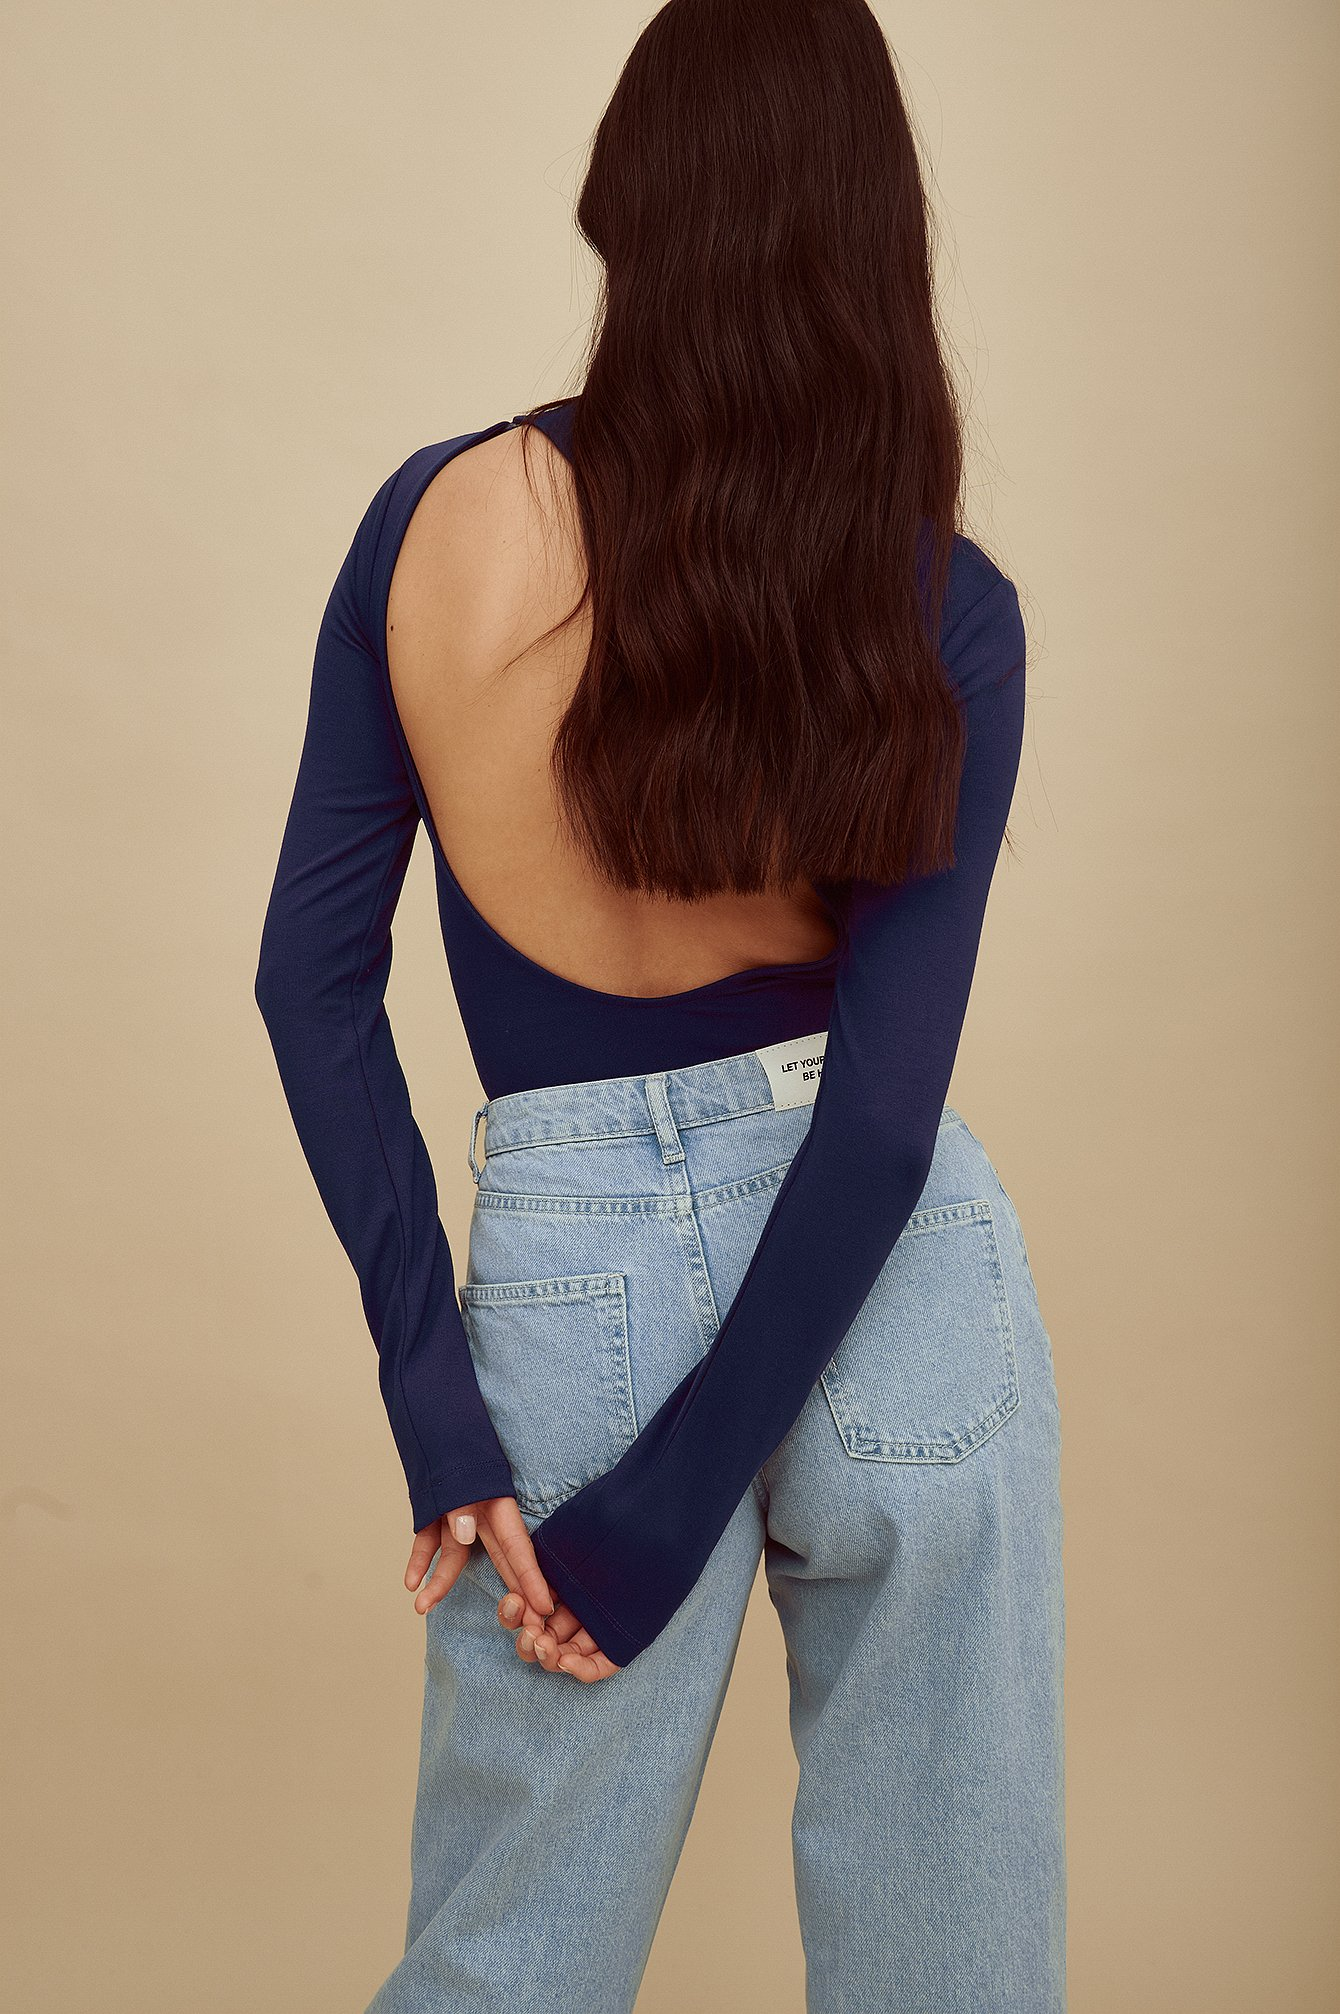 amalie star x na-kd -  Langarmbody mit offenem Rücken - Blue